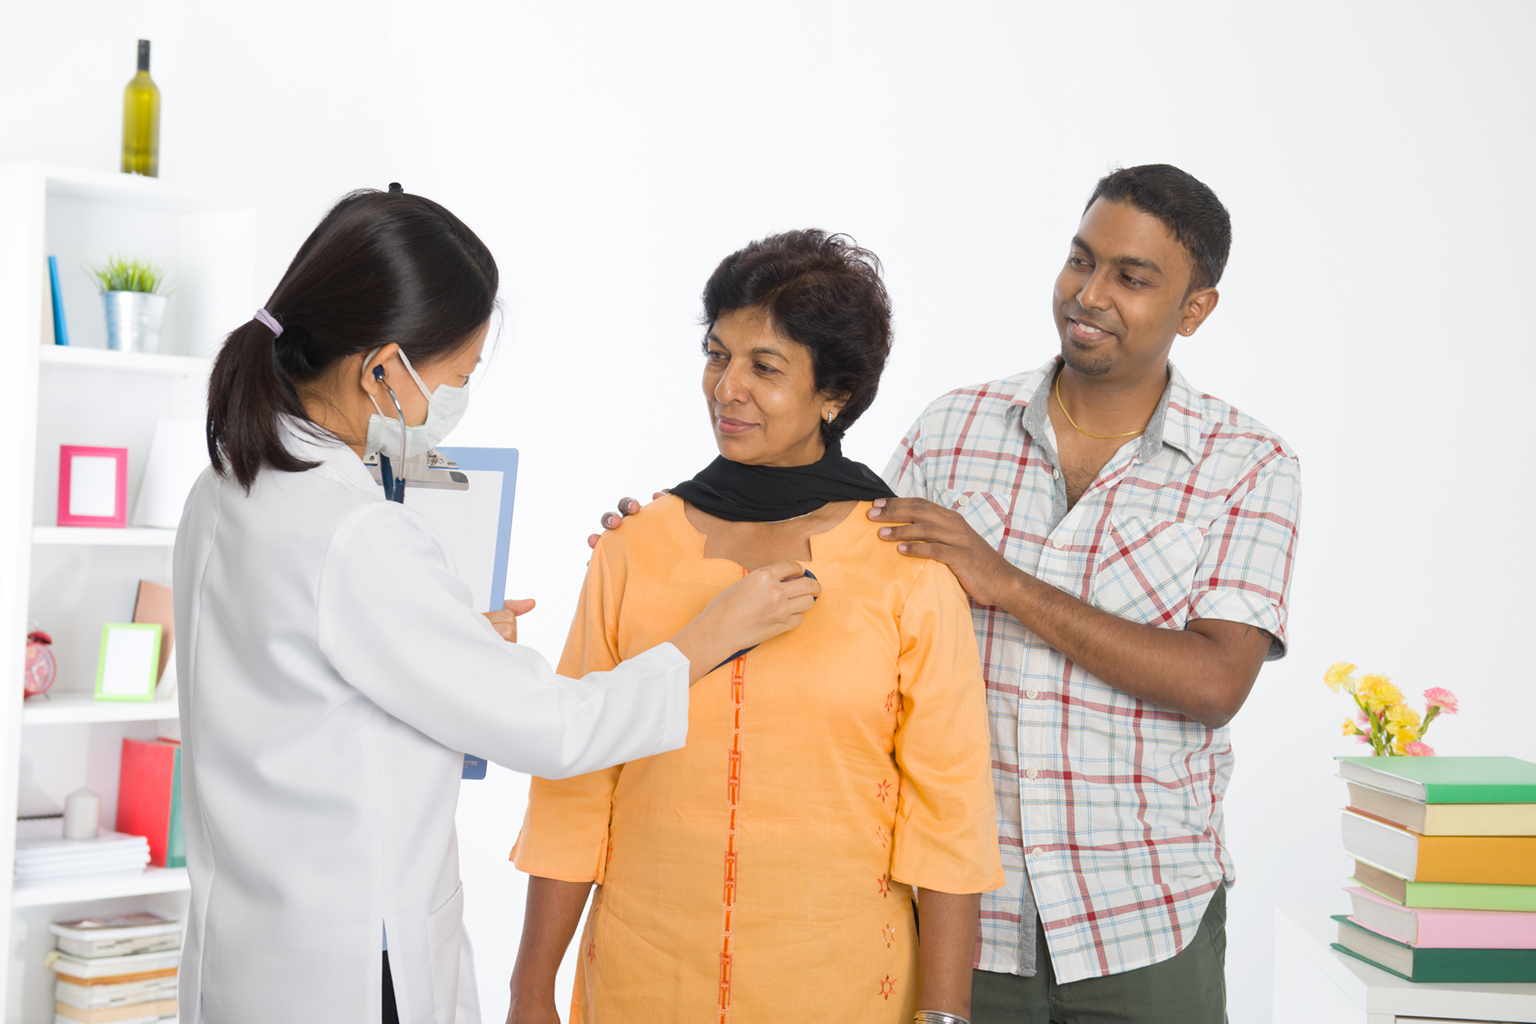 Bringing patients back: Five ways to make patients feel safe